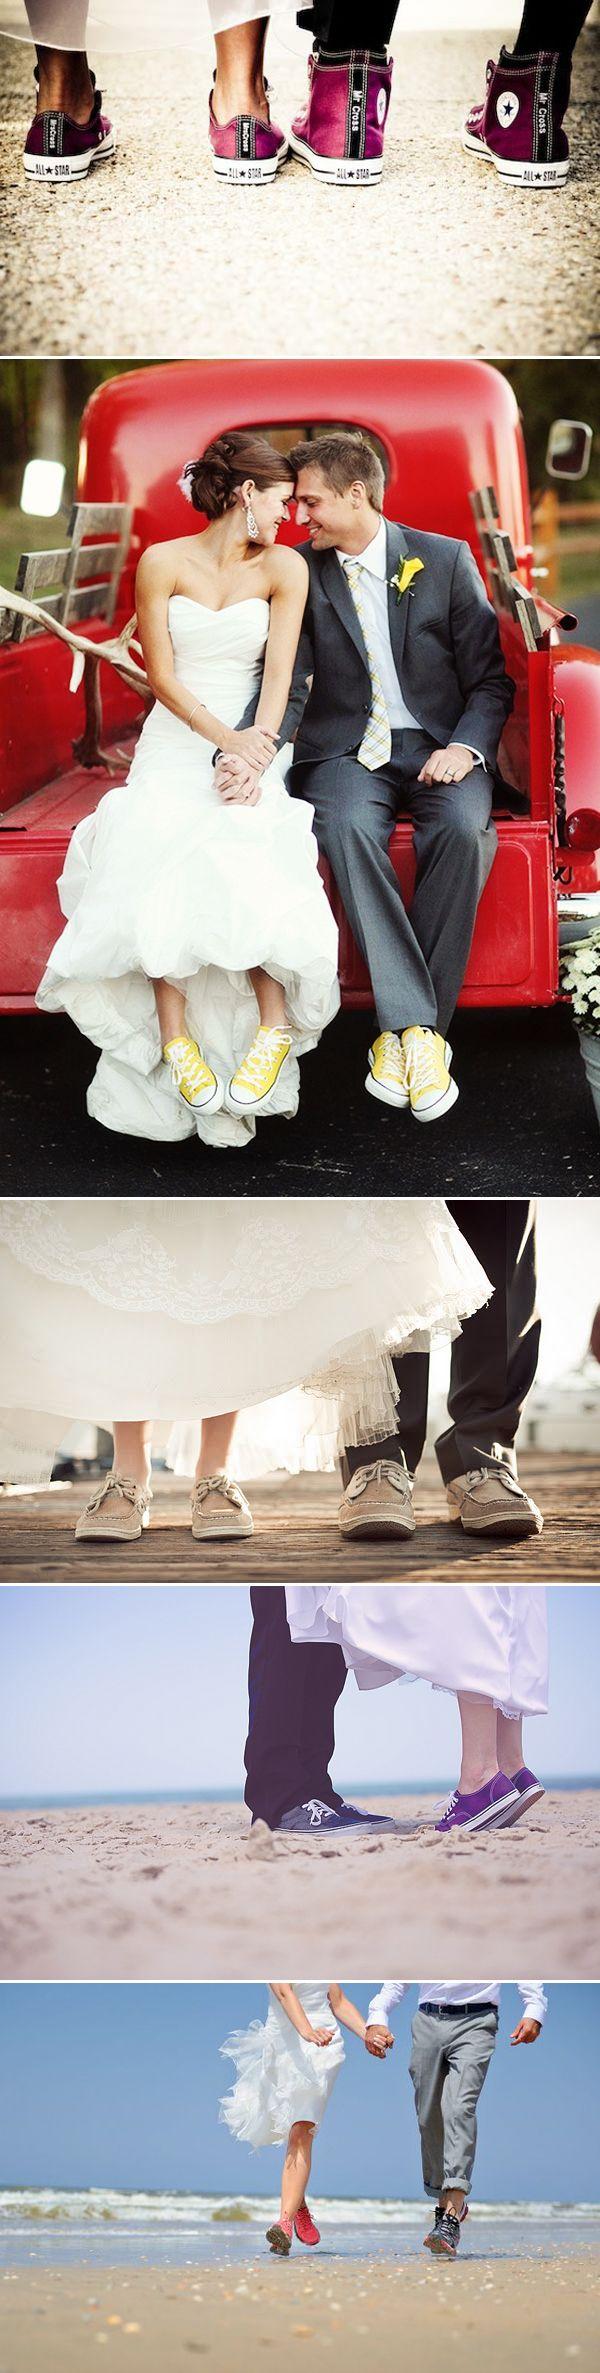 Matching Feet! 21 Creative Matching Wedding Shoes